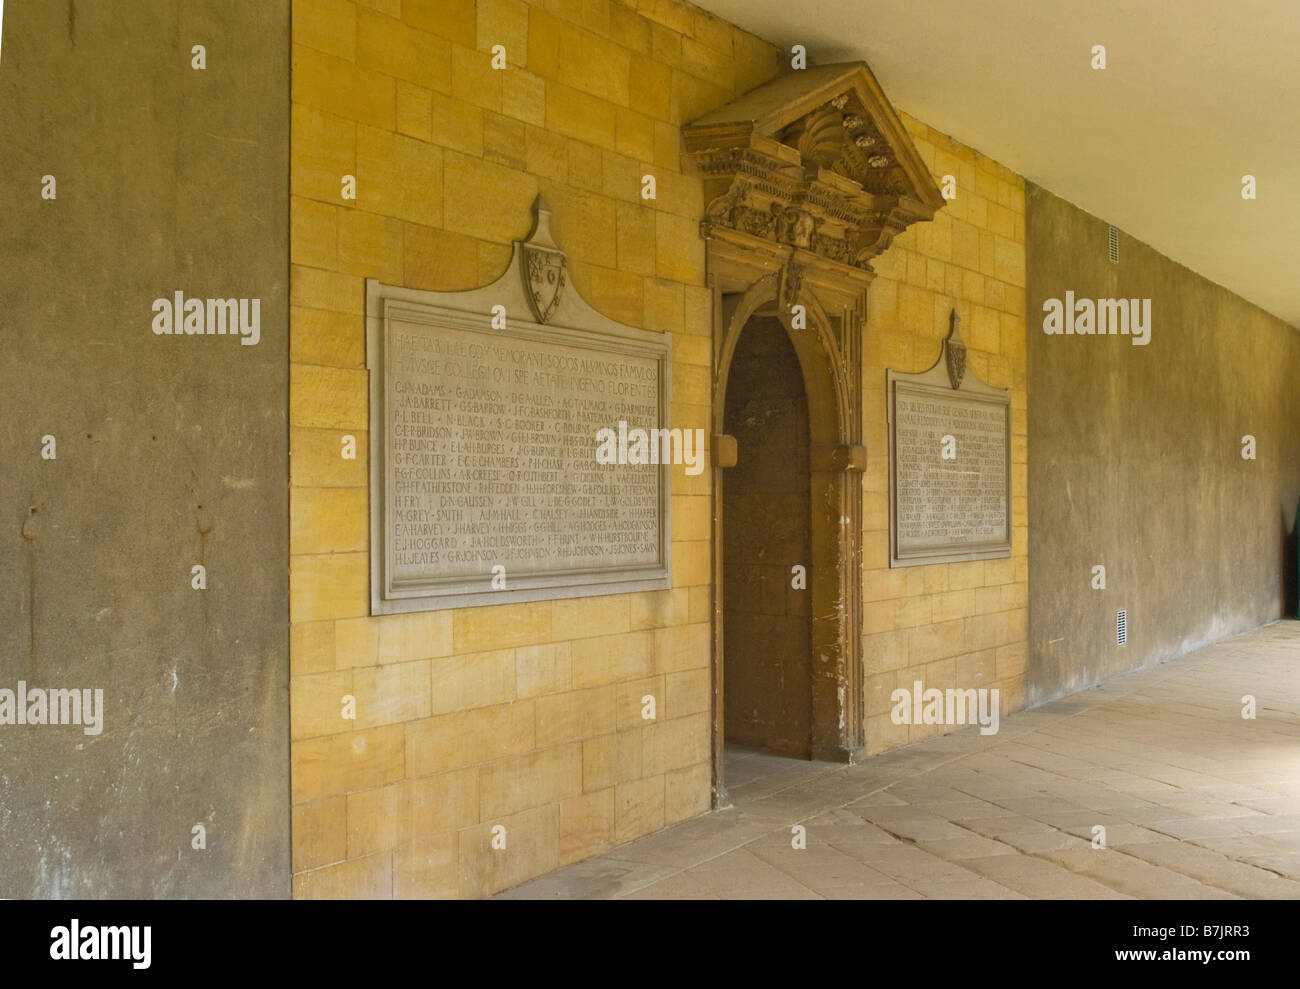 St Johns College, Oxford University - Stock Image